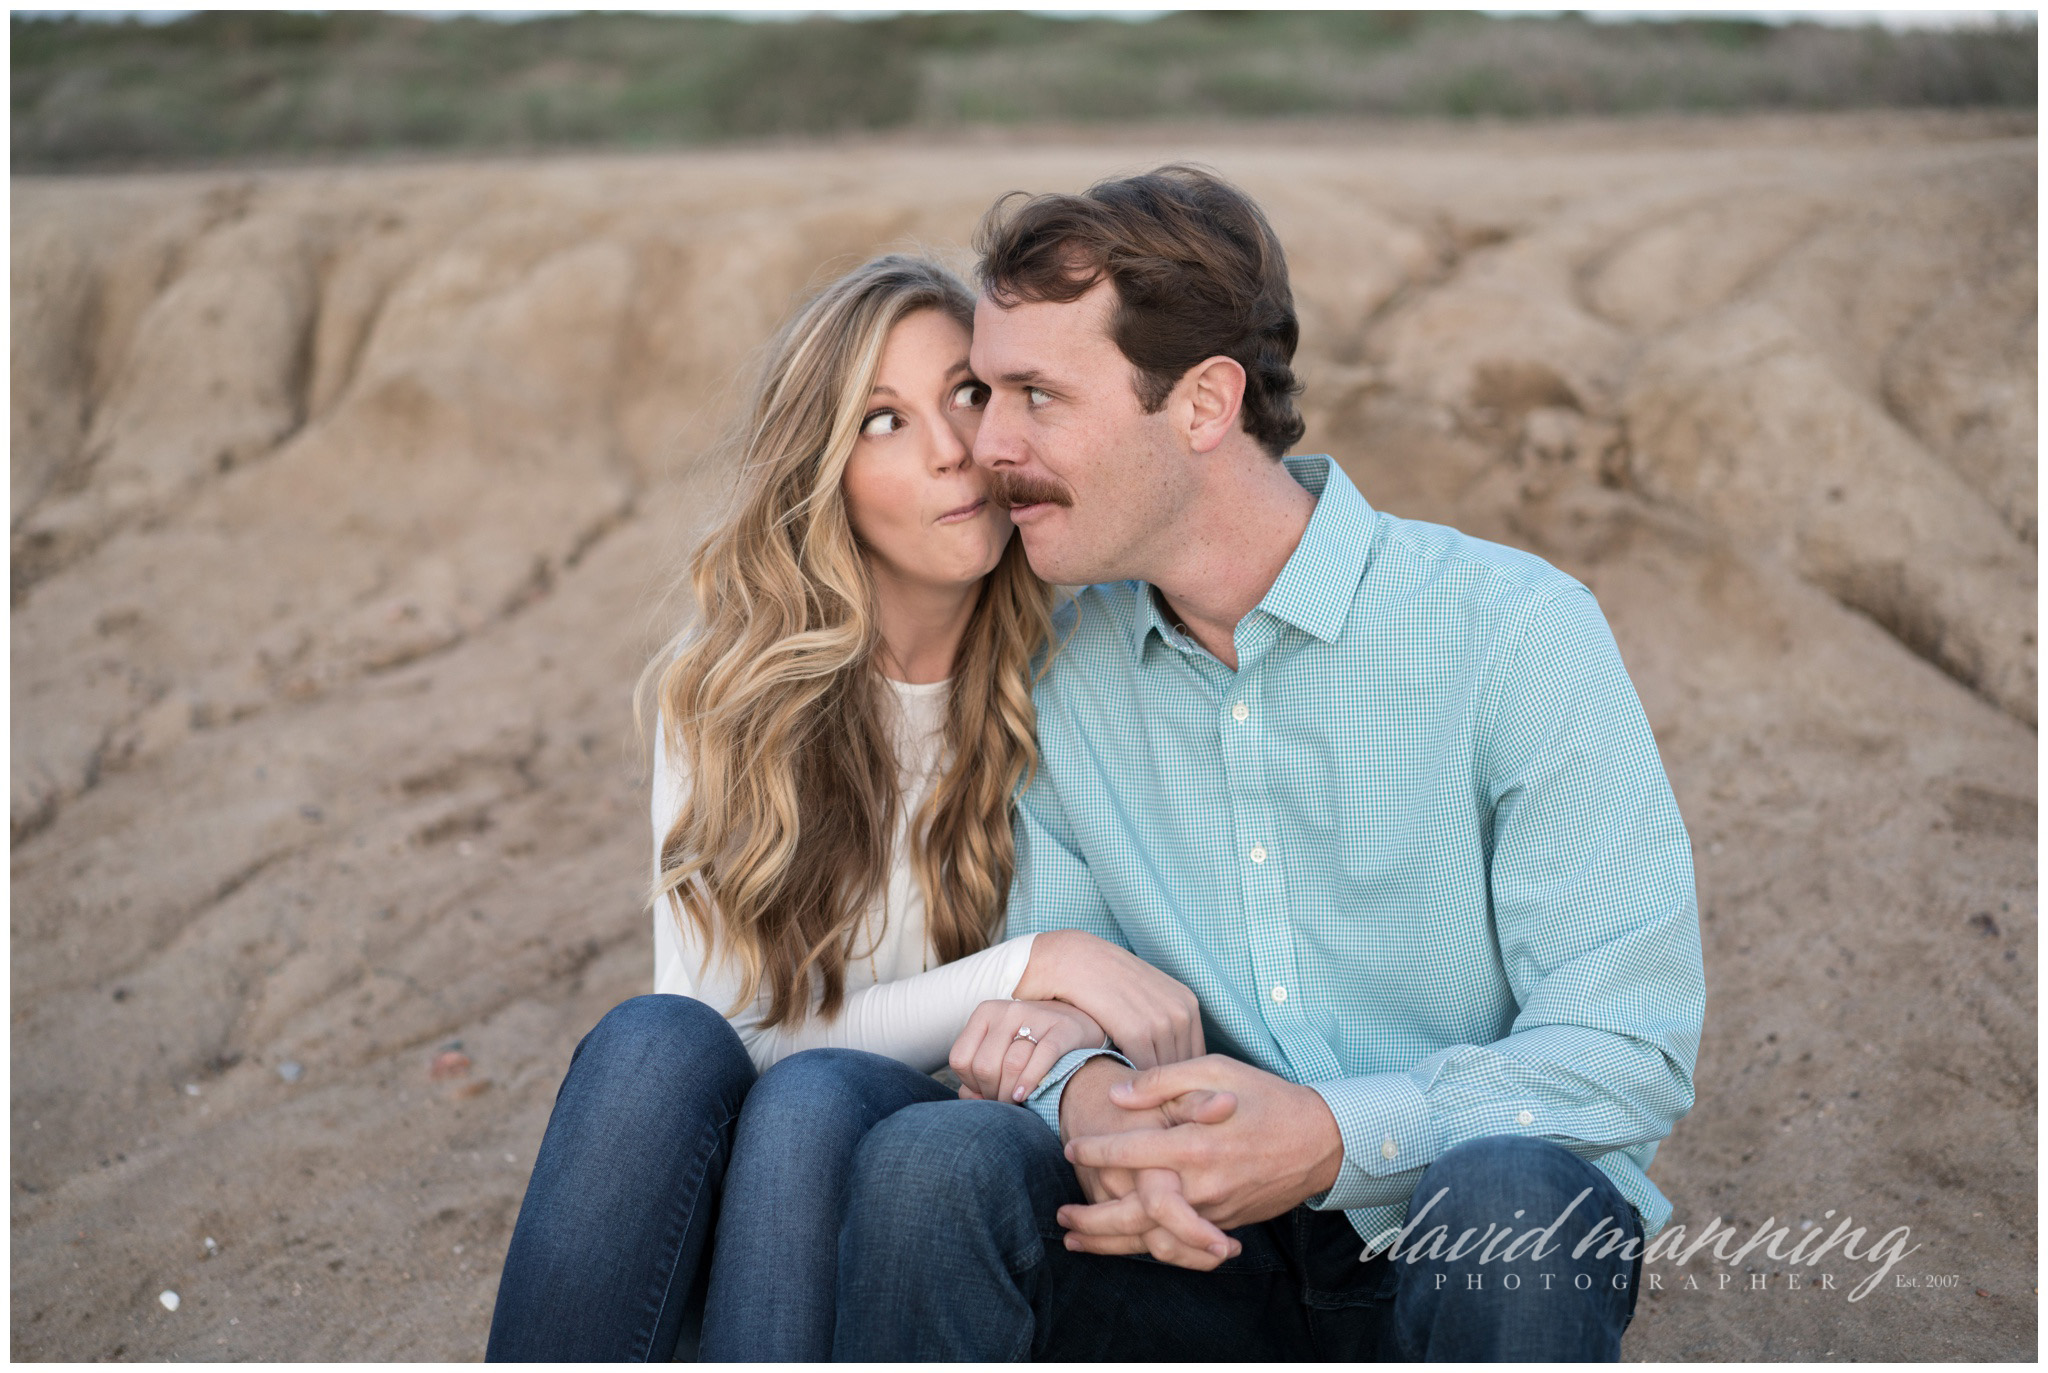 Alyssa-Taylor-Engagement-David-Manning-Photographer-0155.JPG